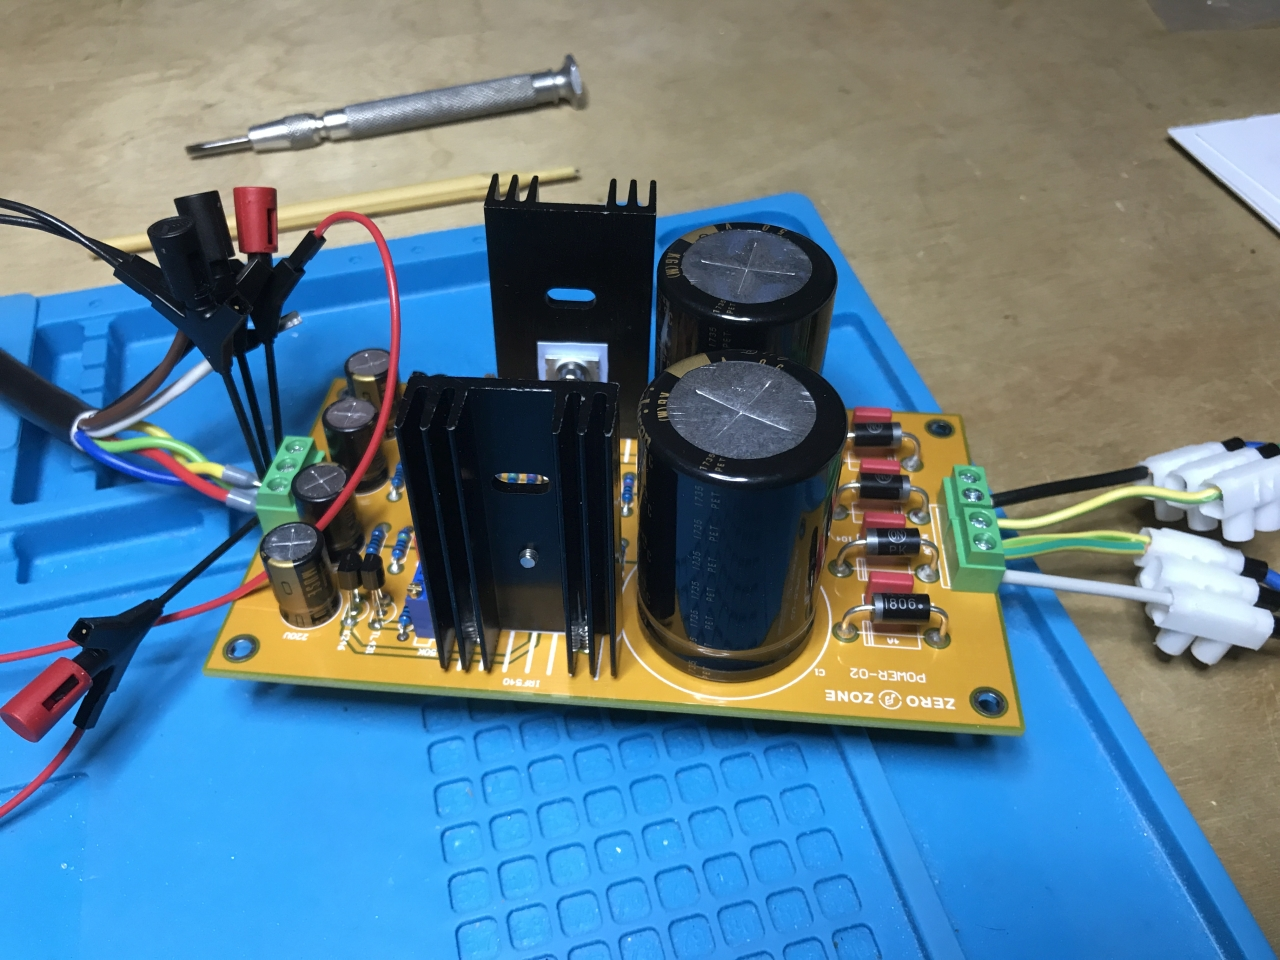 Wayne's BA 2018 linestage-power-supply-board-kit-bay-jpg